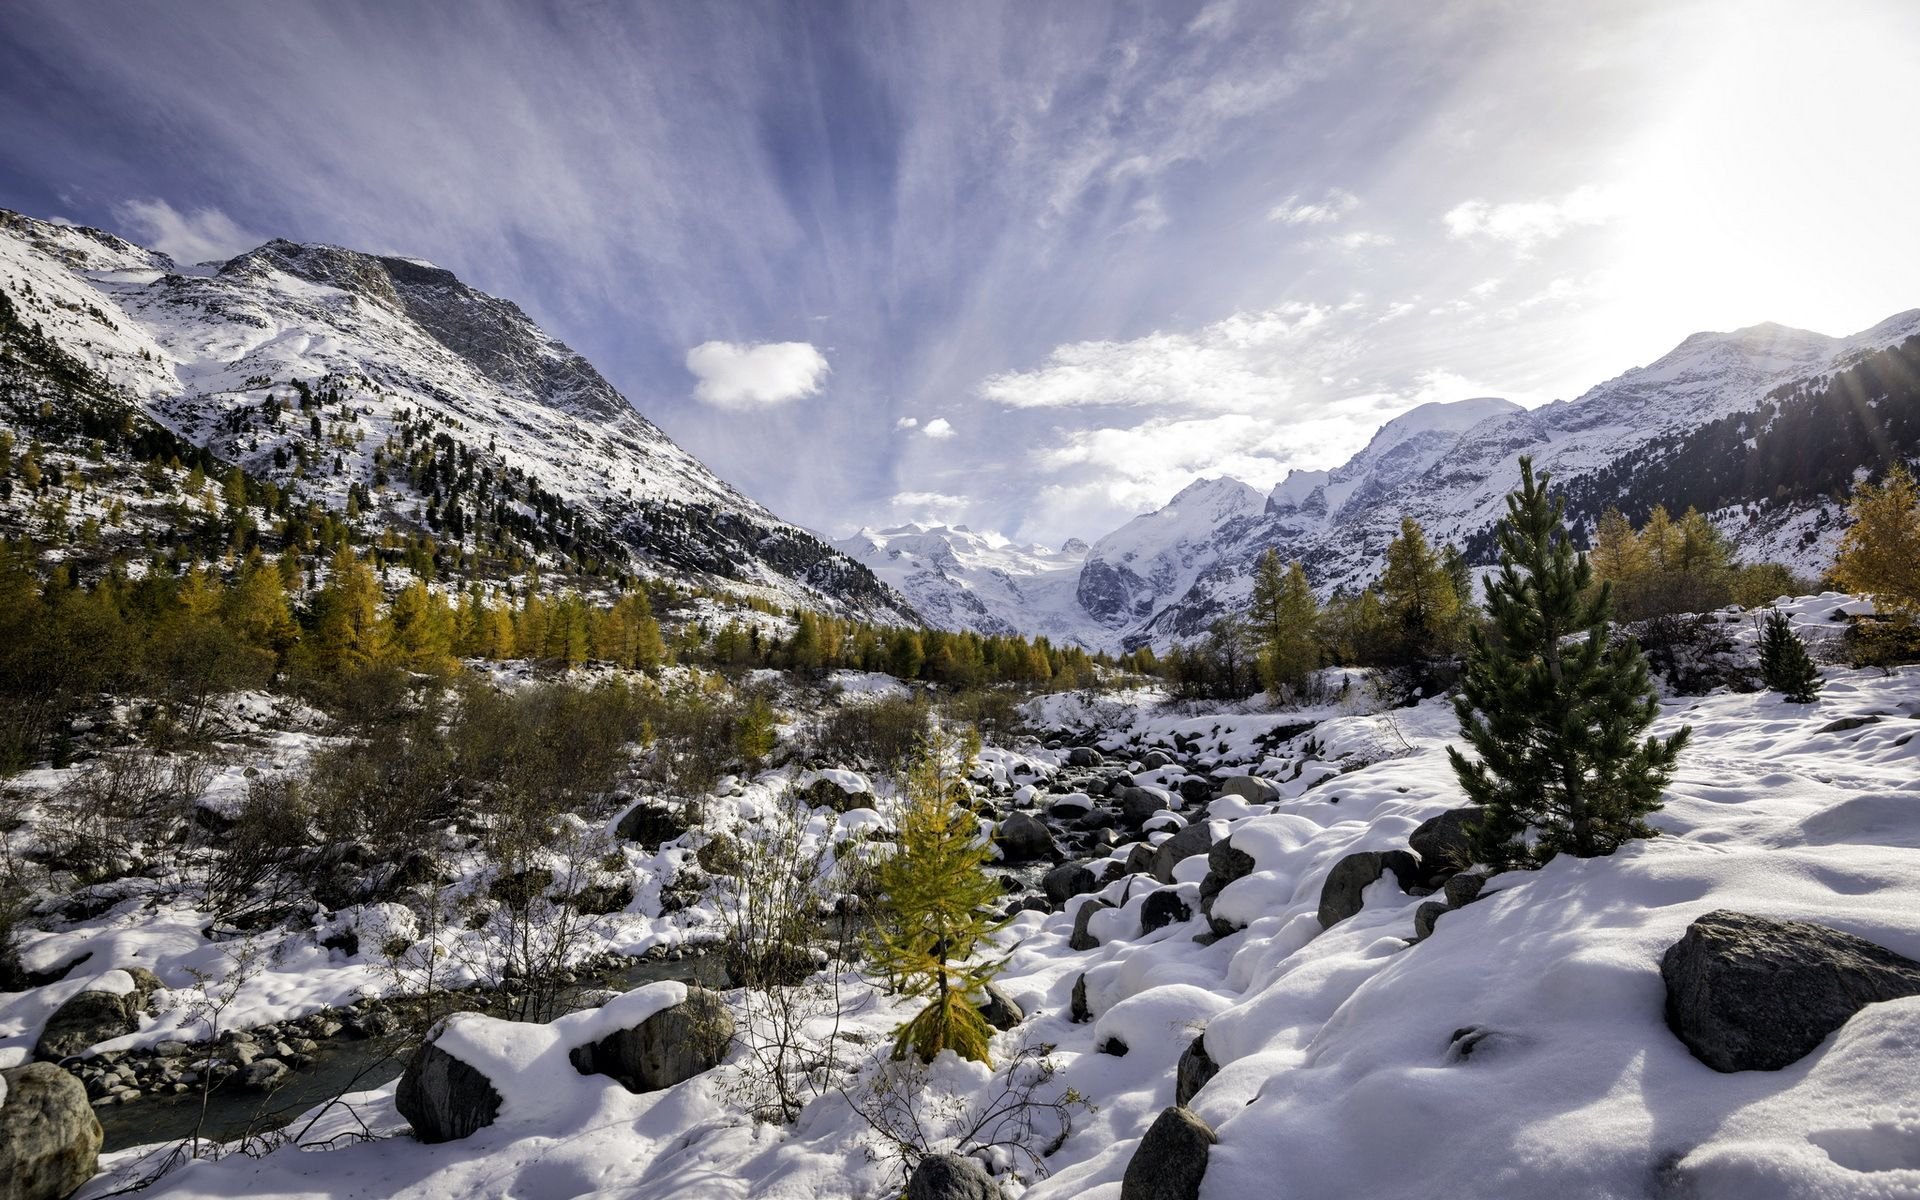 Download wallpaper autumn vs. winter, val morteratsch, pontresina, landscapes resolution 1920x1200